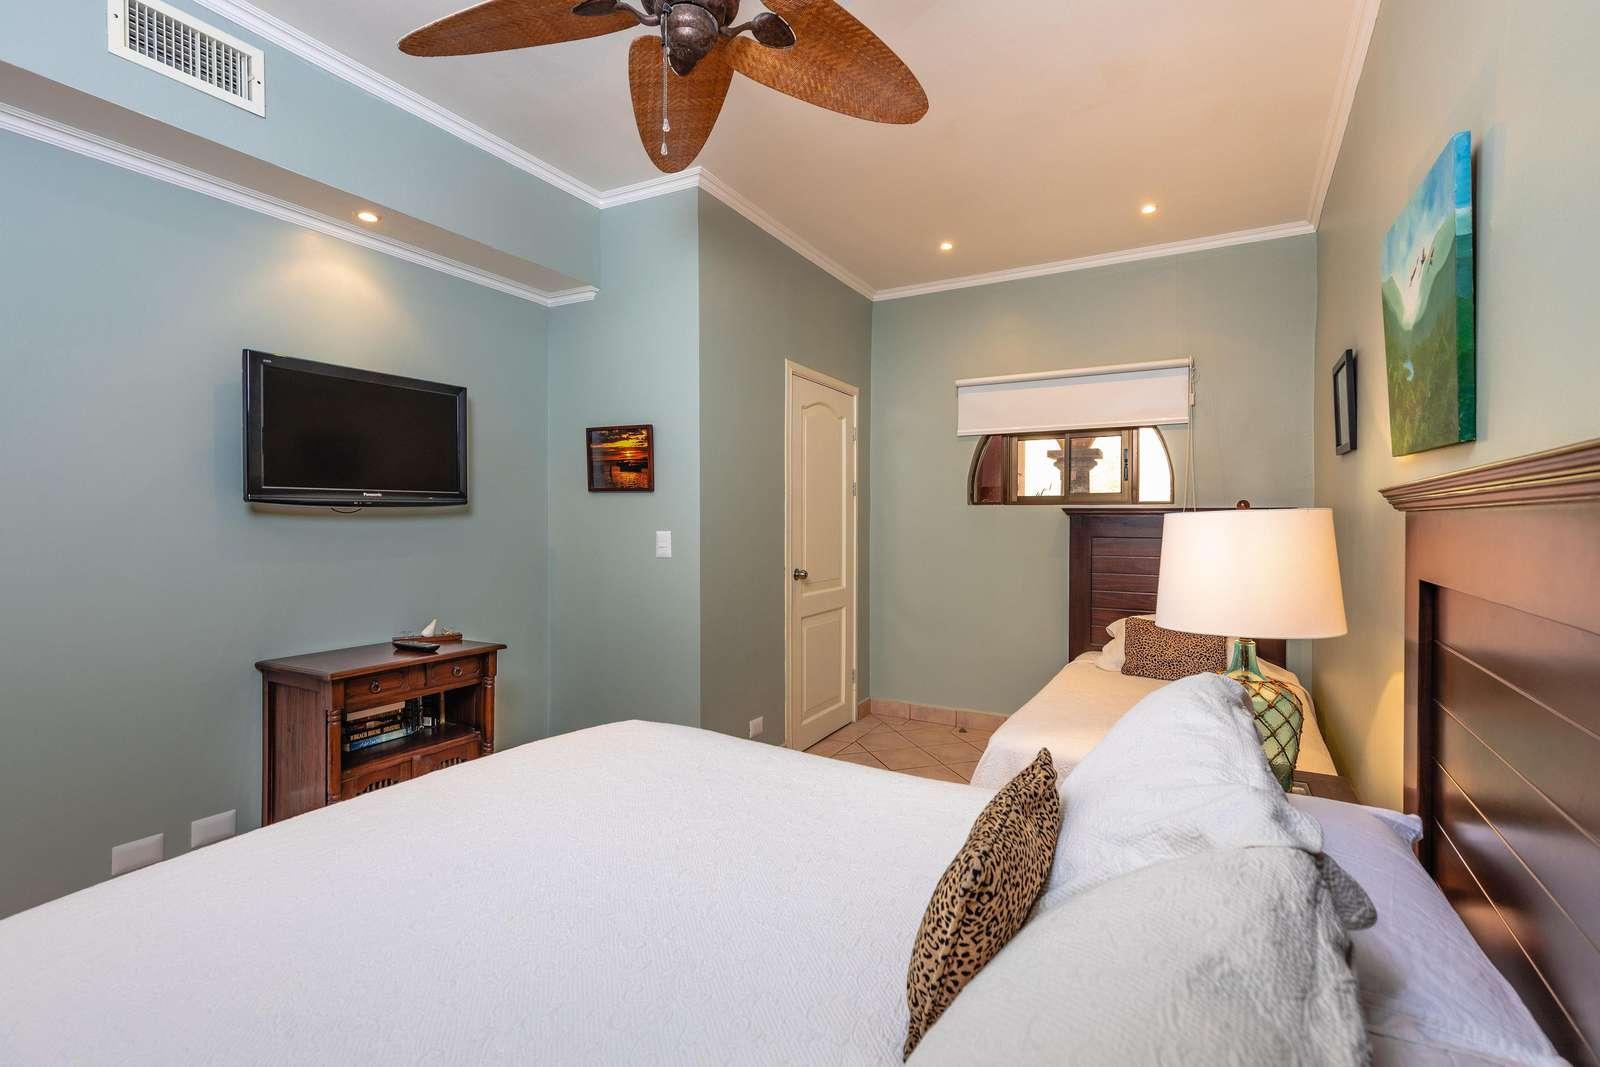 Guest bedroom, Queen bed and twin bed, Flat screen TV, full bathroom